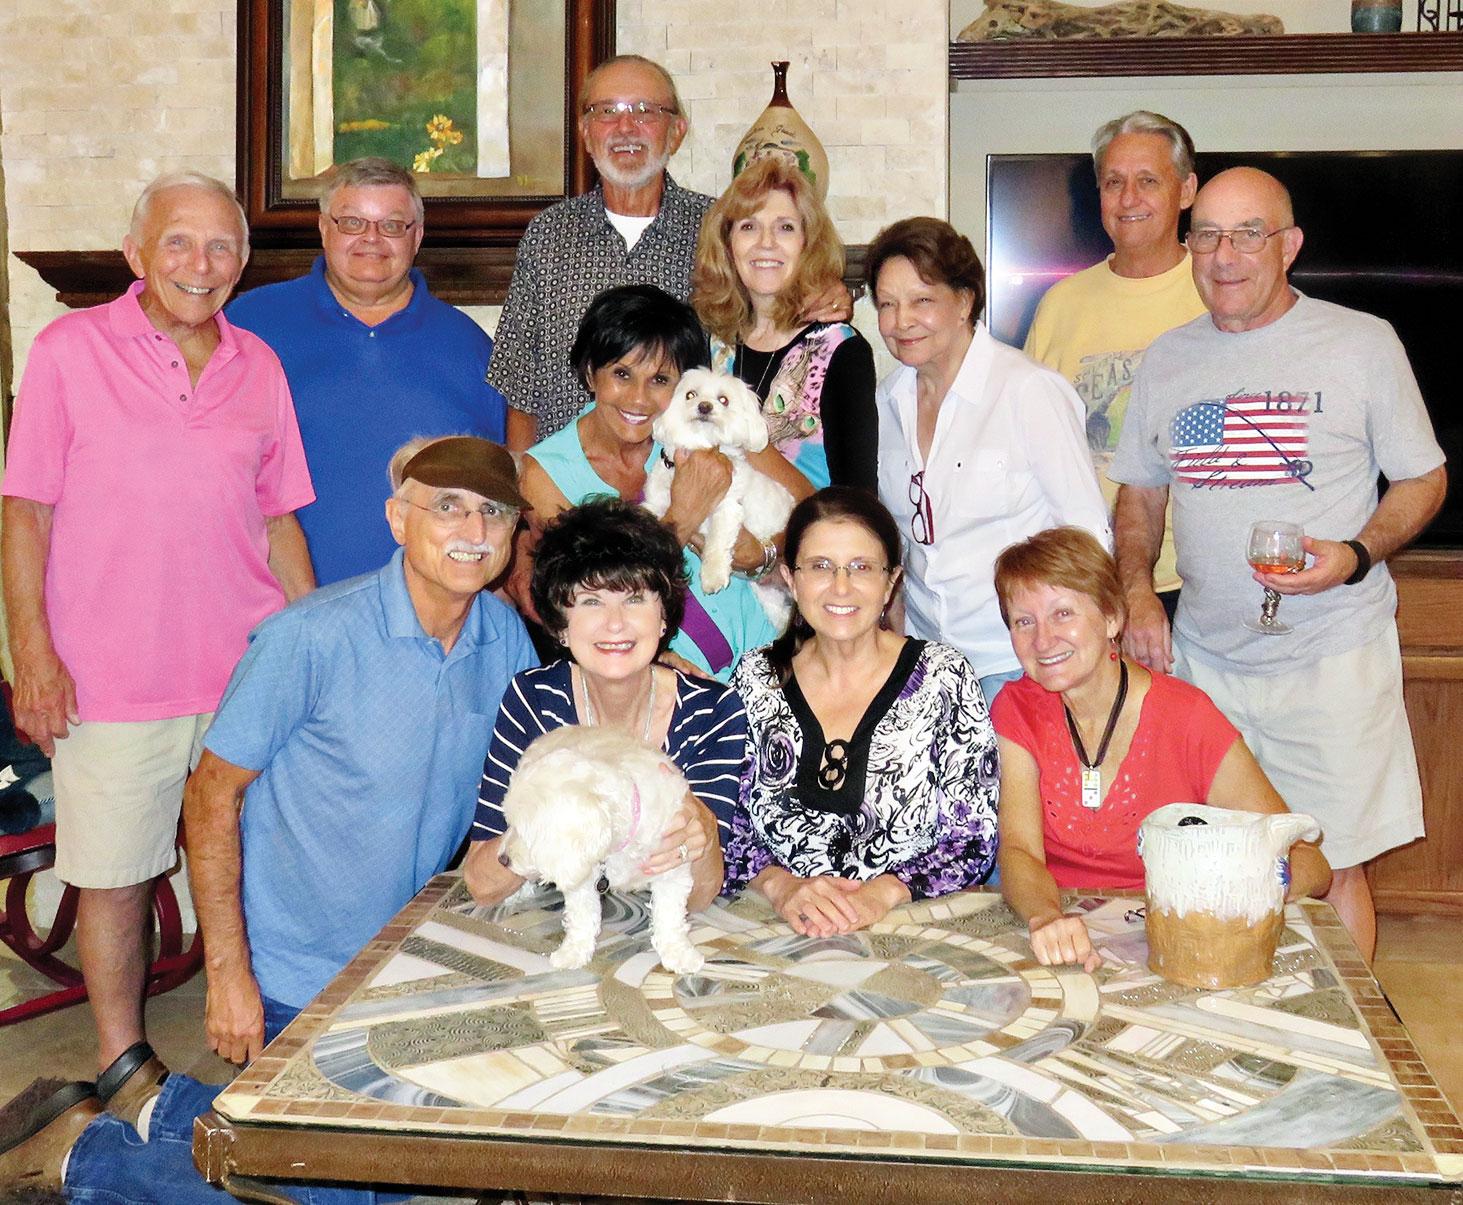 Front row: Angel Bone; second row: Nancy Toppan, Kathy Heberlein and Melodye Rogers; third row: Pete Toppan, Vickie and Nizhoni Bone, Joyce Frey, Millie and Mike Aramanda; fourth row: Jere Bone, Ed Heberlein, Bill Frey and Bobby Rogers